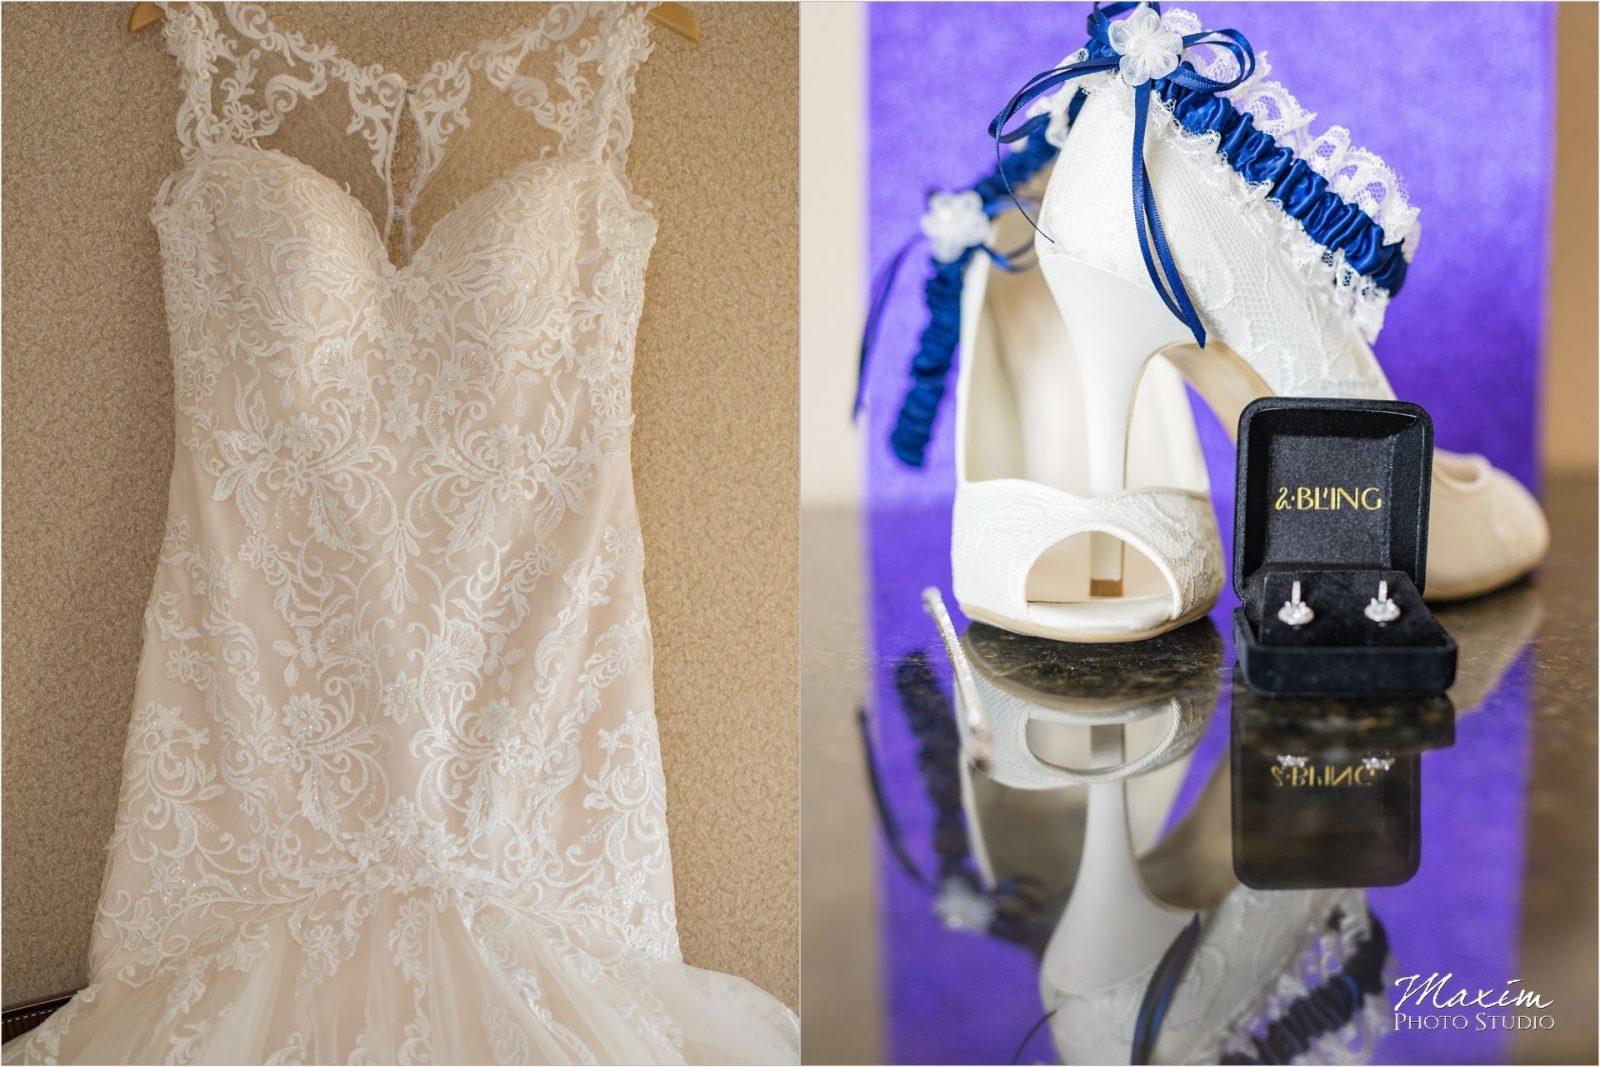 Pattison Park Lodge Wedding Preparations